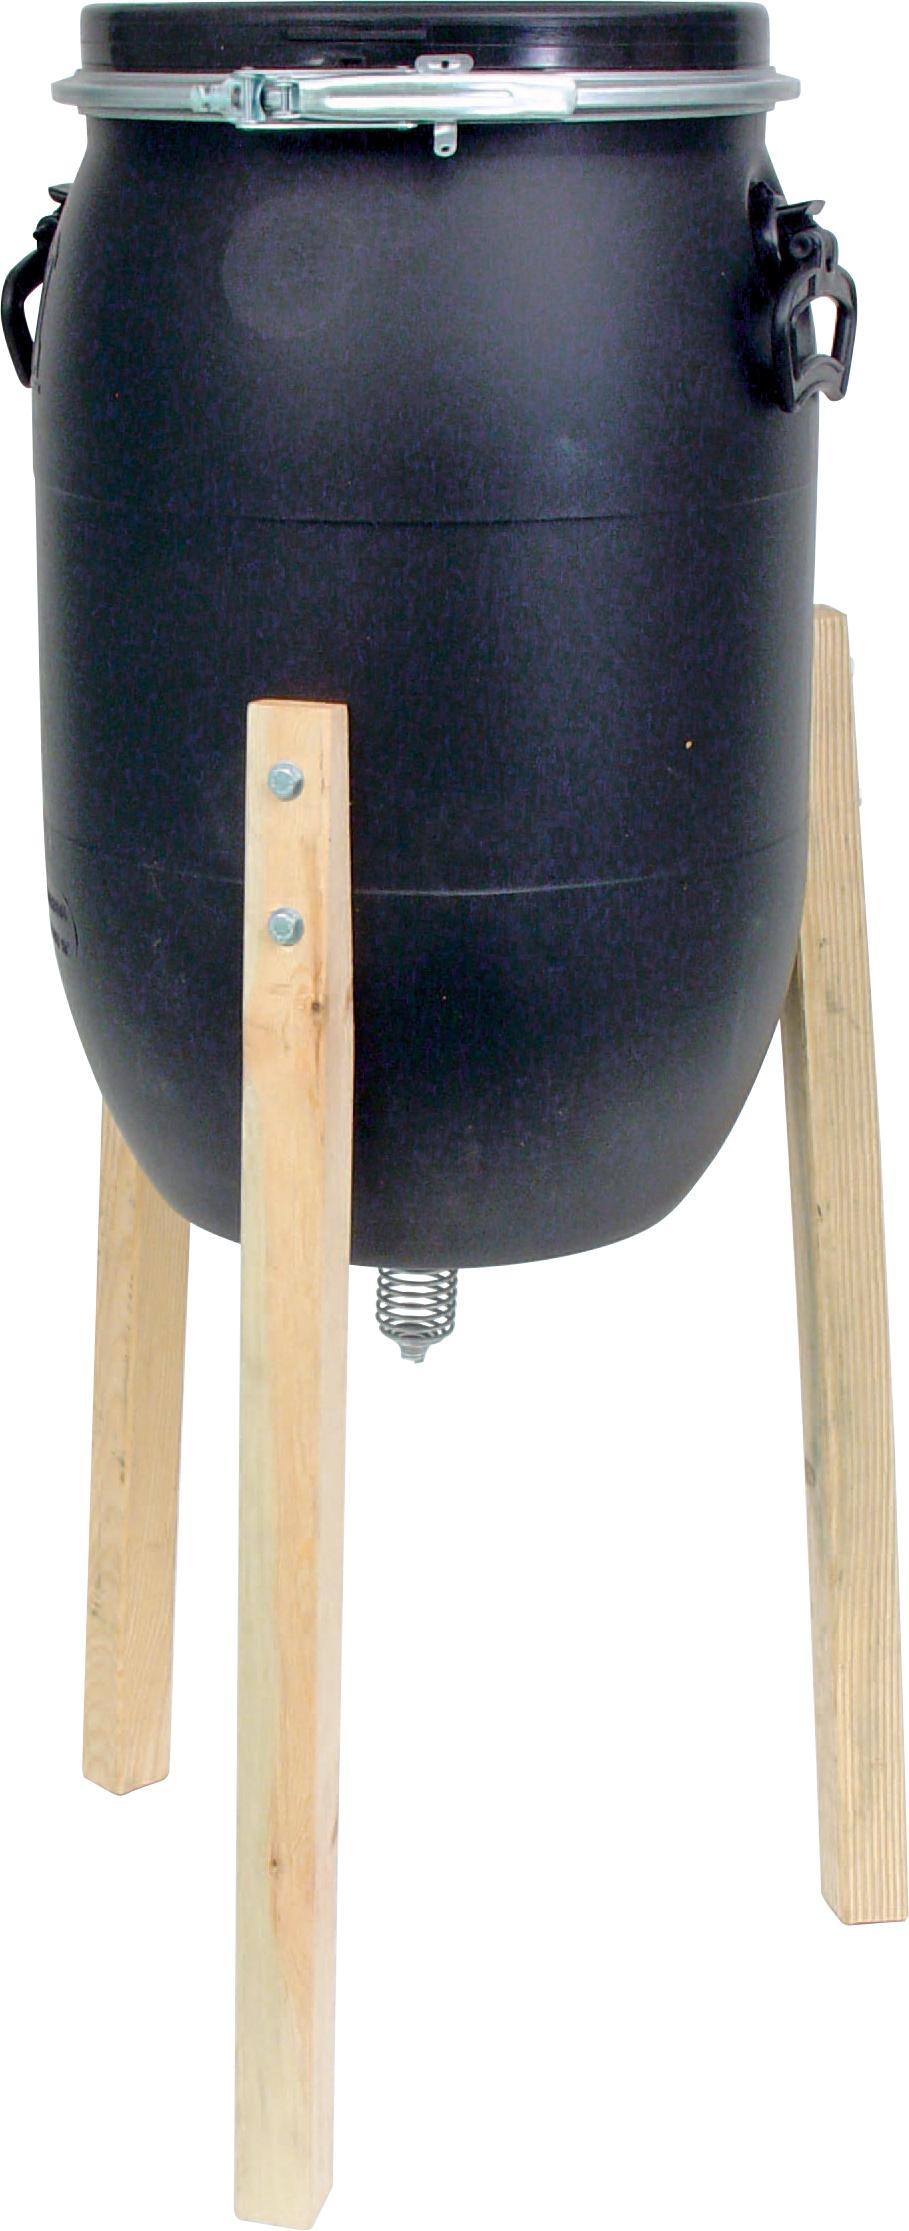 Viltfoderautomat, 55 kg